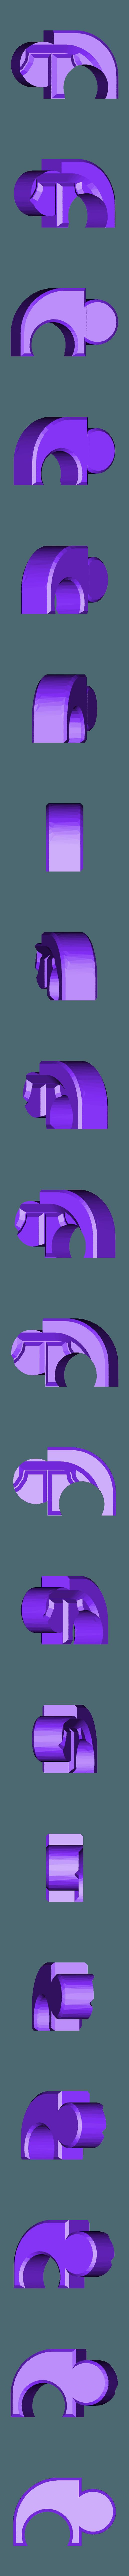 Pieza_esquina_1.stl Download free STL file Tablero puzzle Bilbao • Model to 3D print, alexanderegido